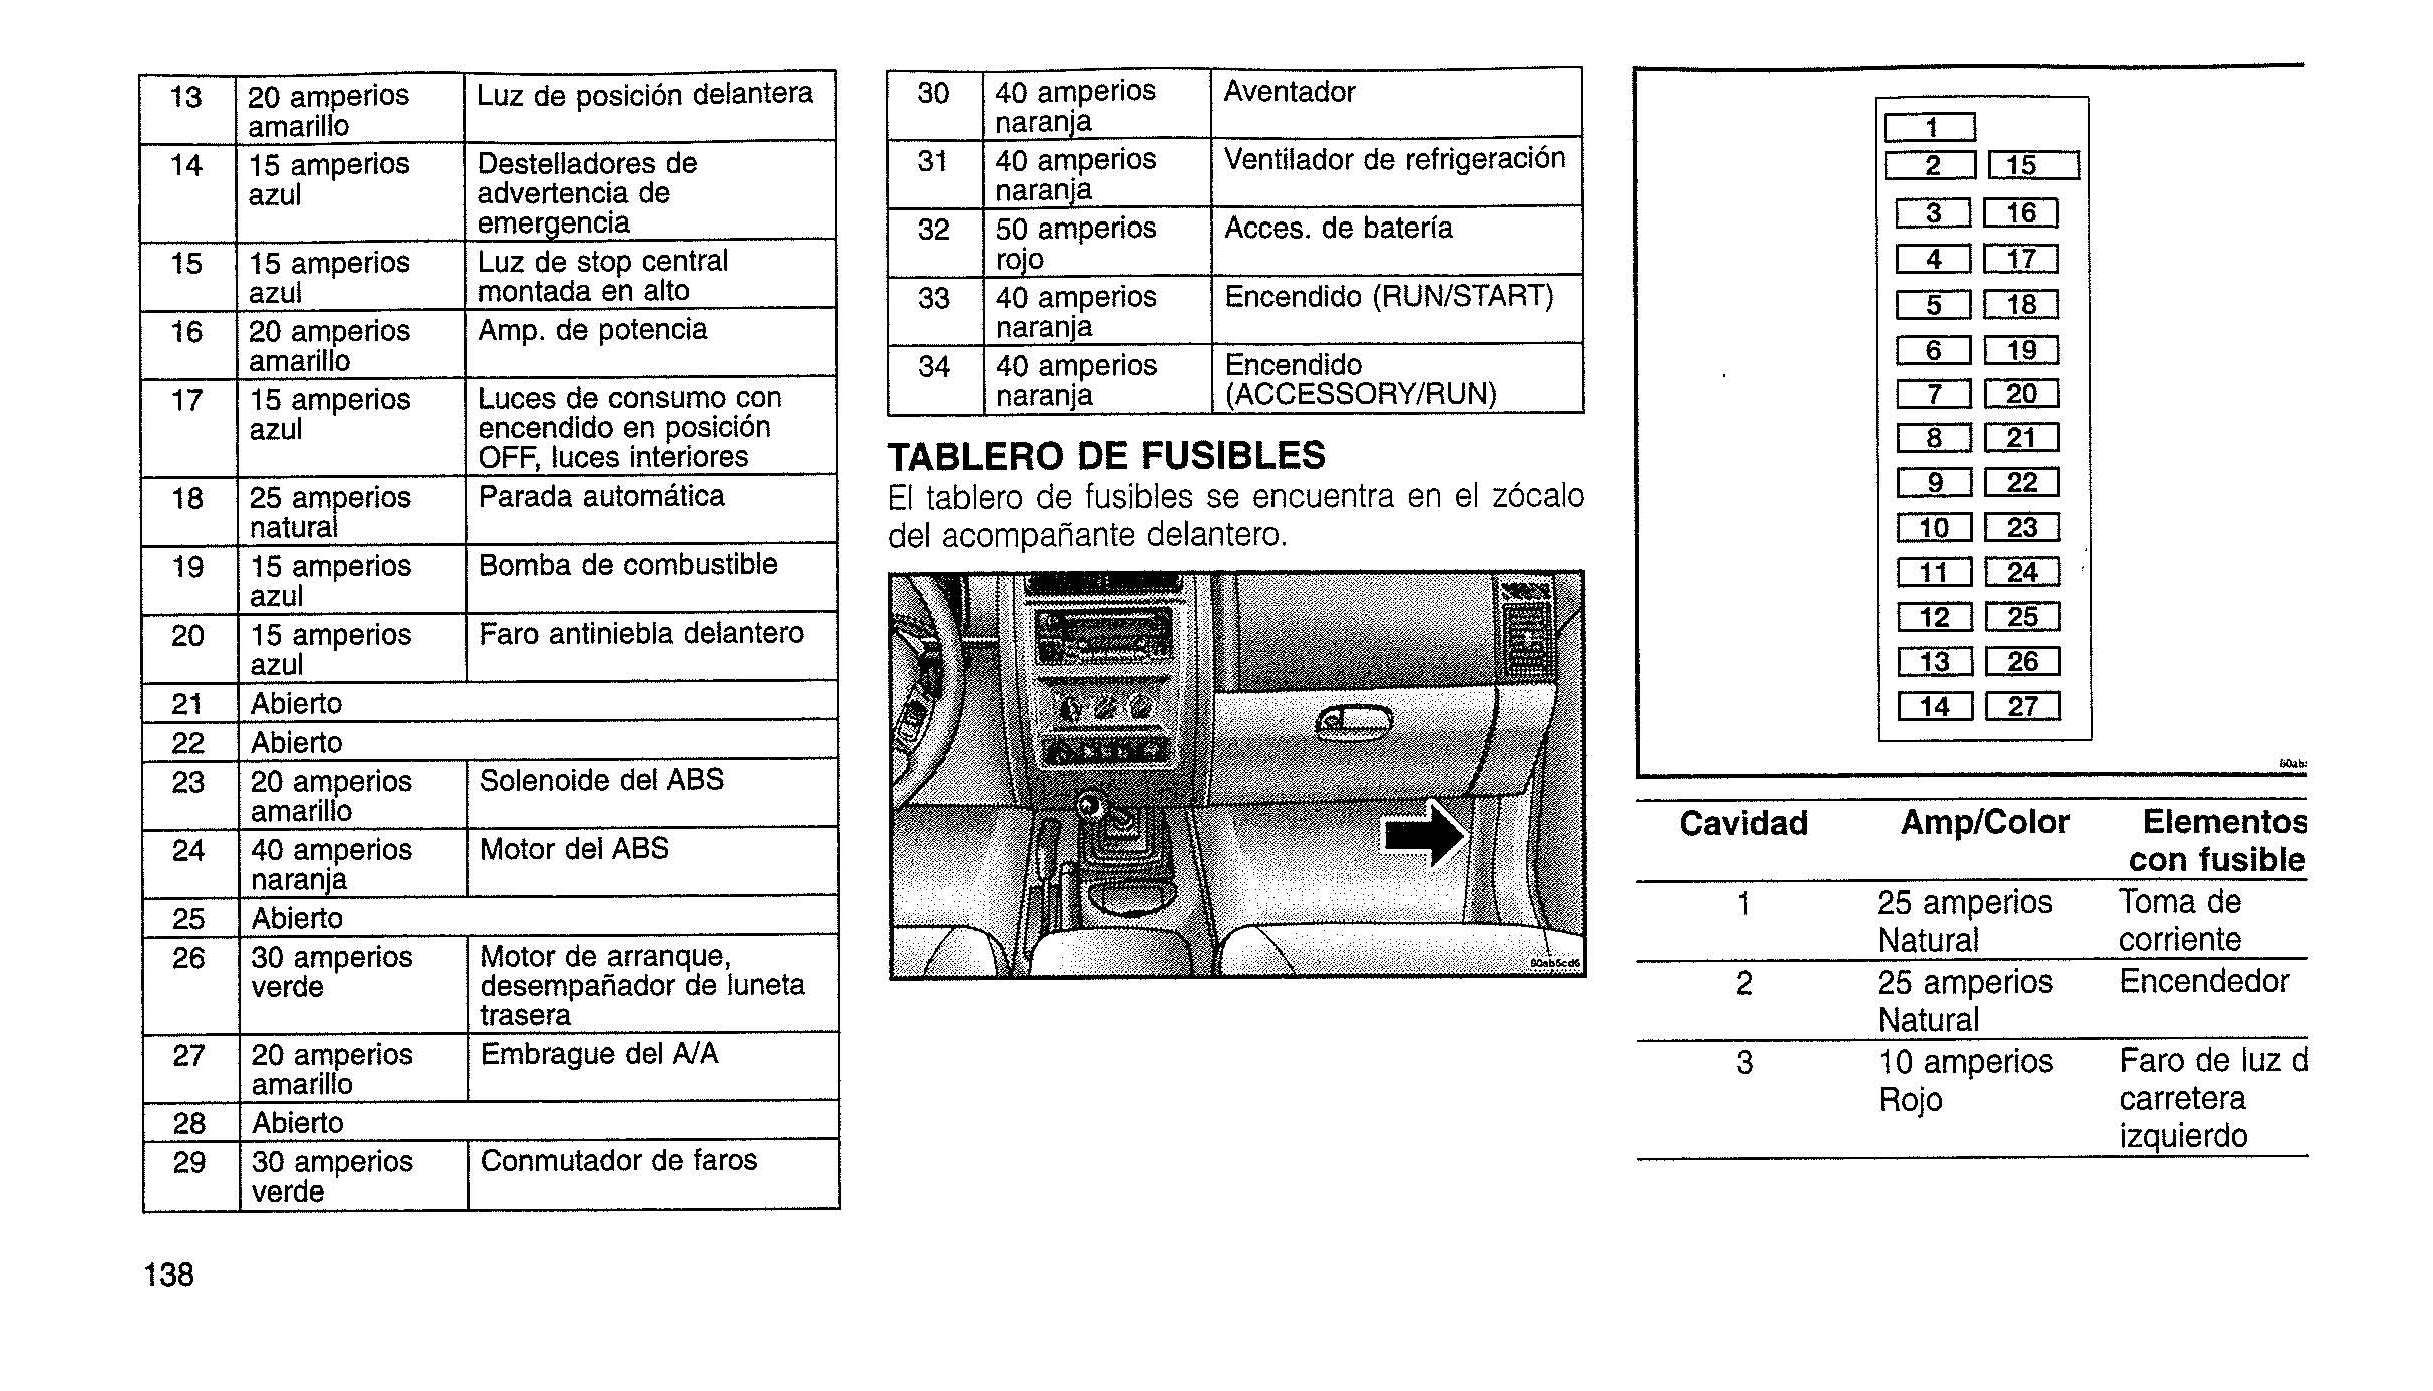 Watch also 1996 Chevy Astro Fuse Box Diagram in addition Aftermarket Radio Factory   Wiring Help 75961 in addition Diagrama Caja De Fusibles further 06 Kia Sorento Fuse Box Location. on 2001 kia sportage fuse box location